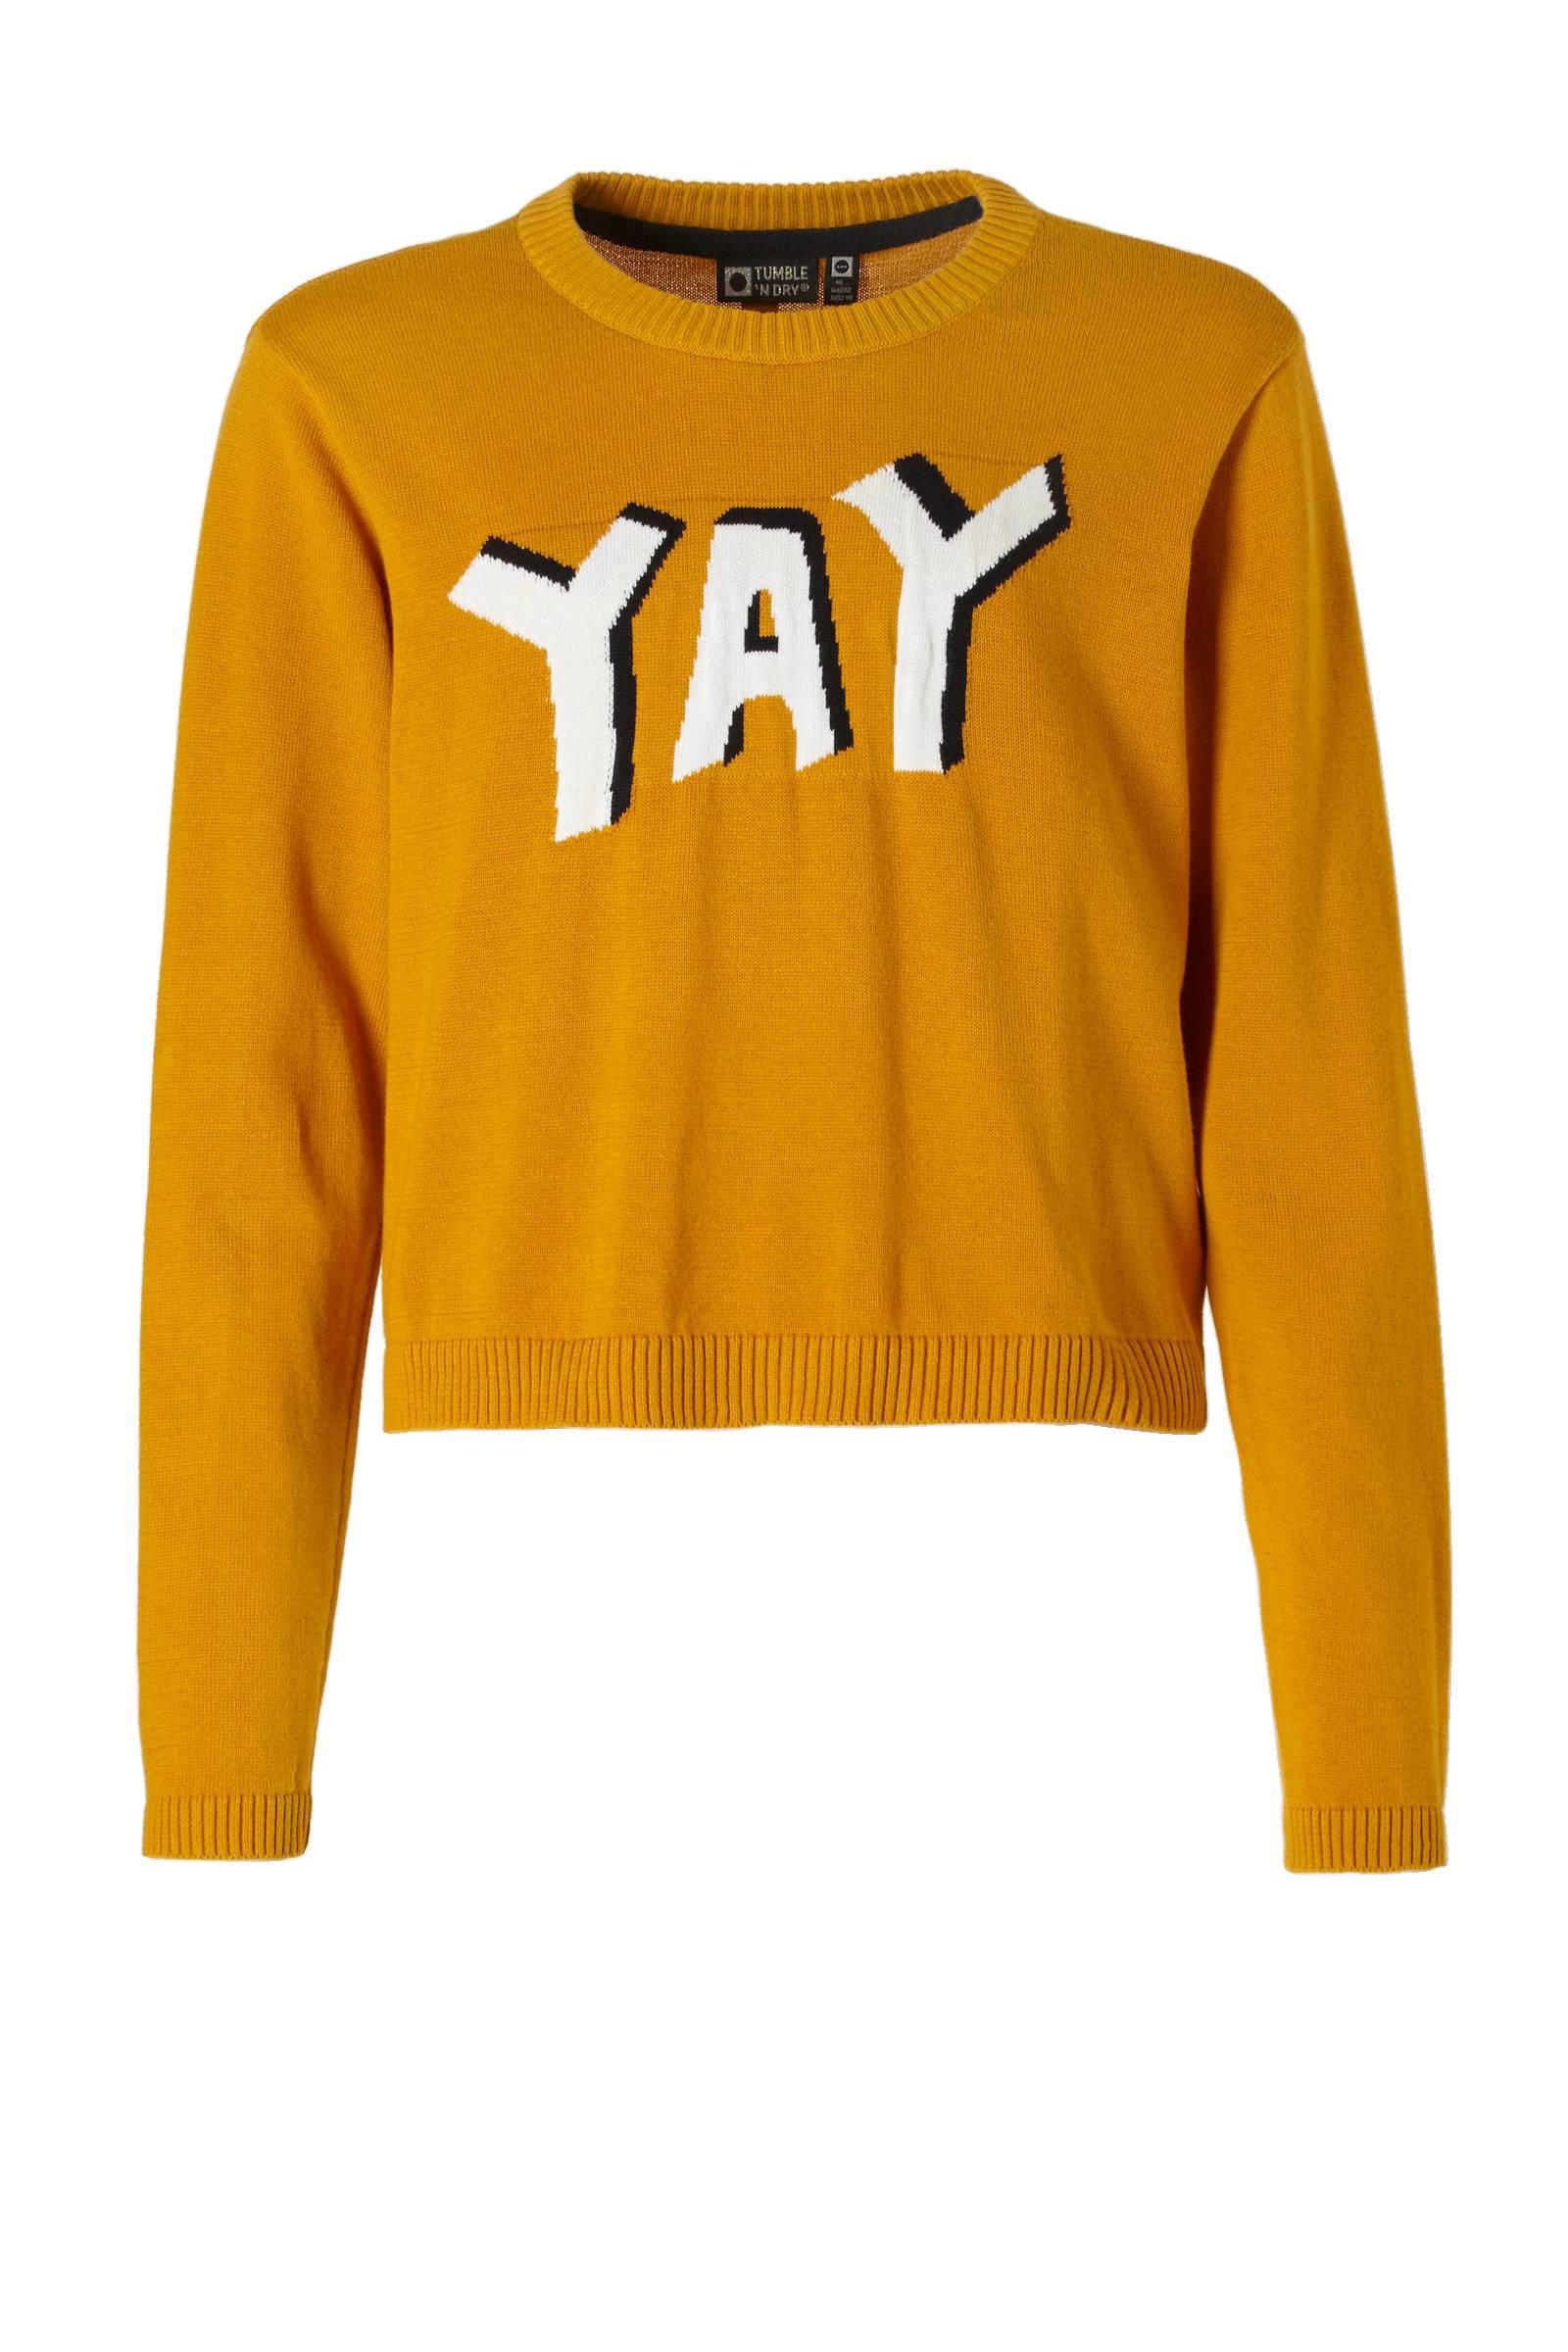 Tumble 'n Dry Hi sweater